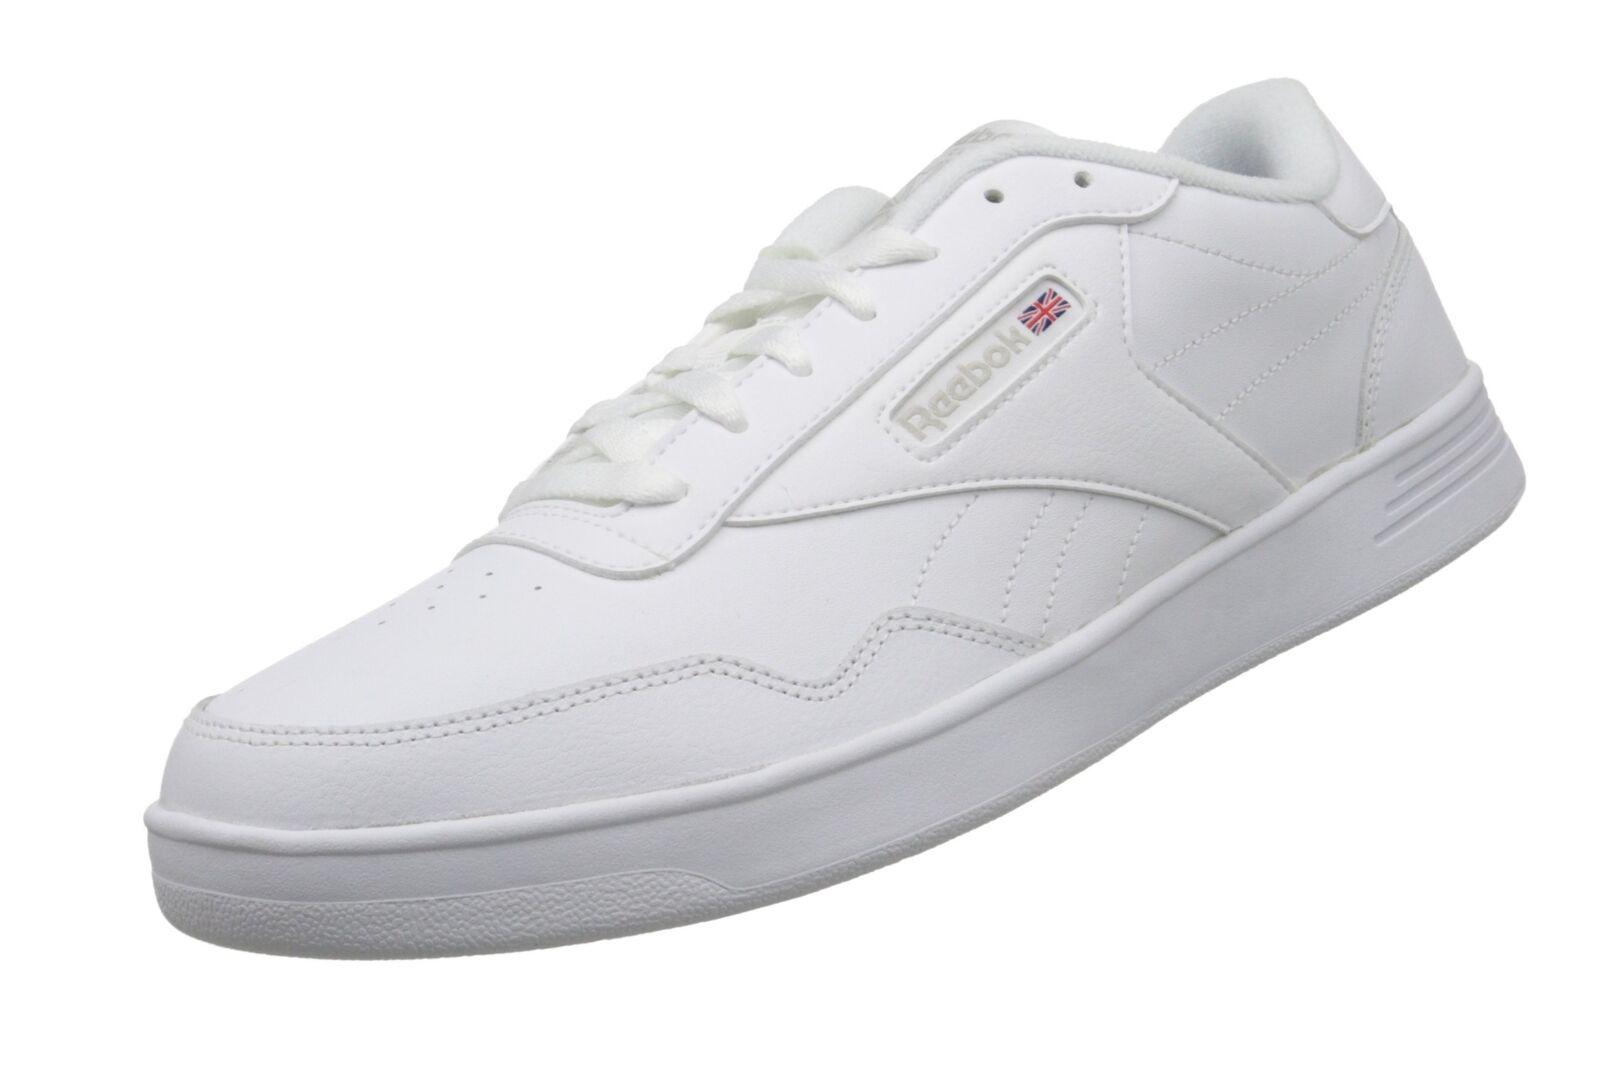 Reebok Men's Club Memt Classic Sneaker Us-white Steel 10.5 ... - FREE 2 Day Ship